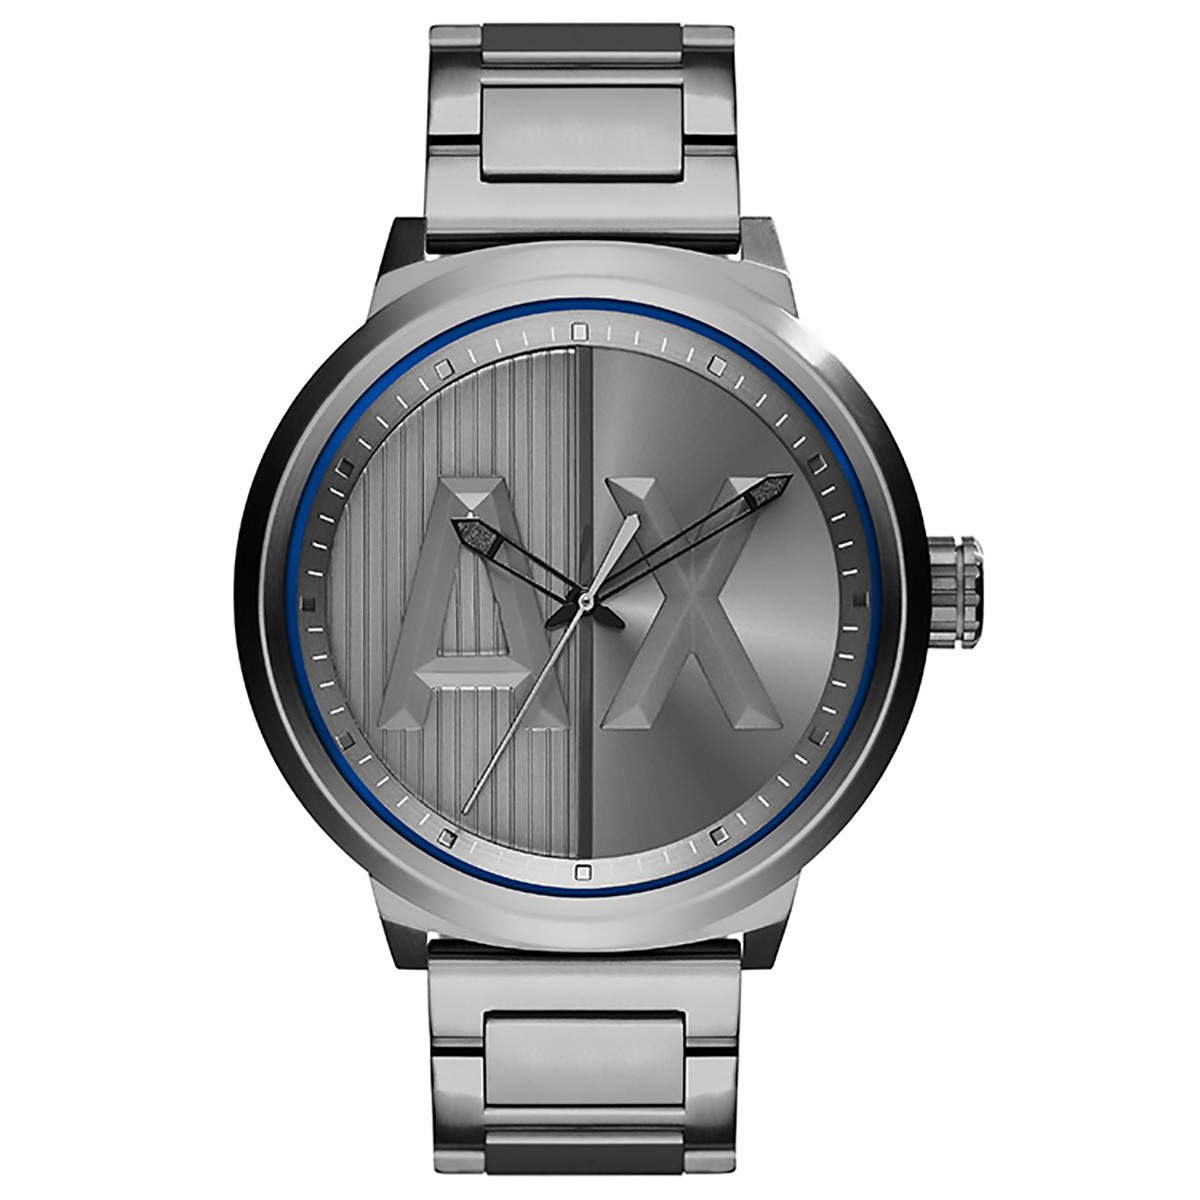 0d7f9ba7b0485 Compre Relógio Armani Exchange em 10X   Tri-Jóia Shop